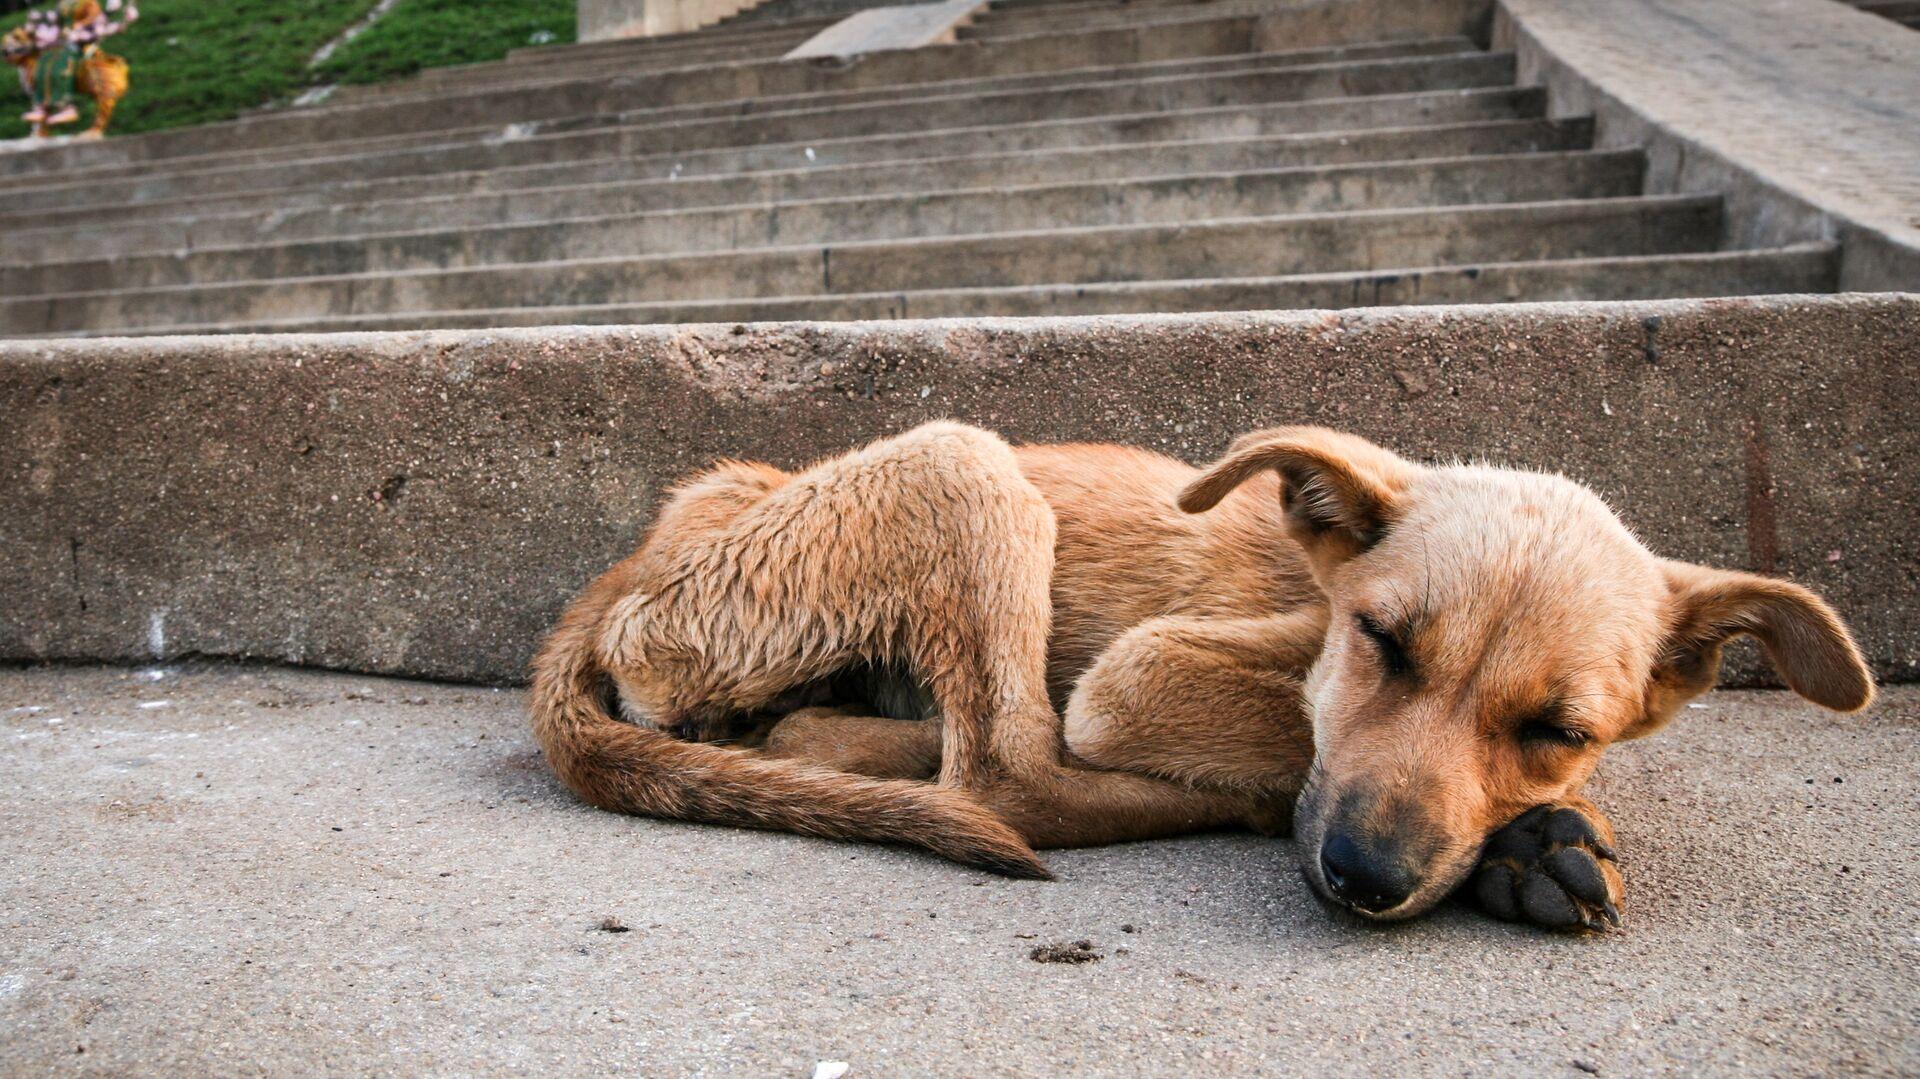 Бездомная собака - РИА Новости, 1920, 11.05.2021